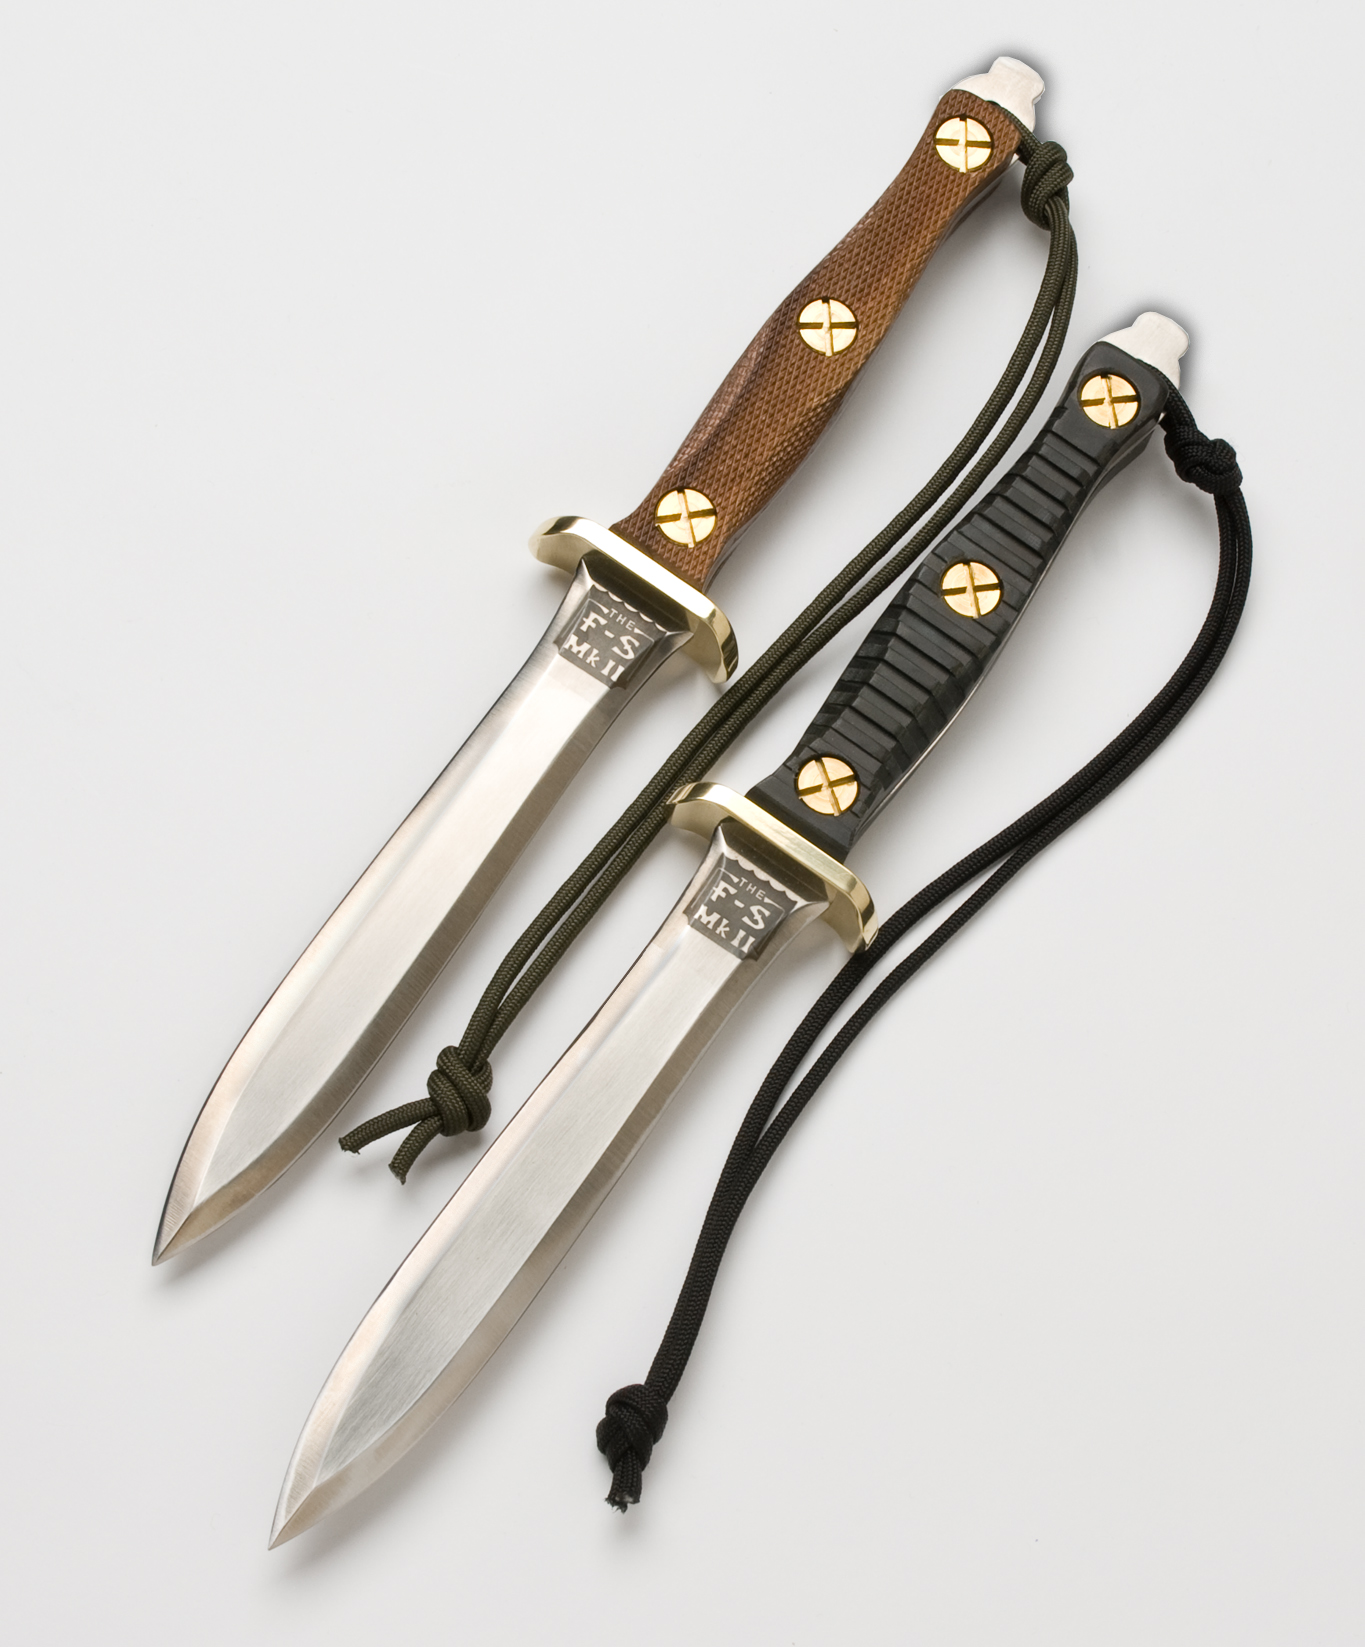 The Cutting Edge Ek Fairbairn Sykes Mk Ii Fighting Knife